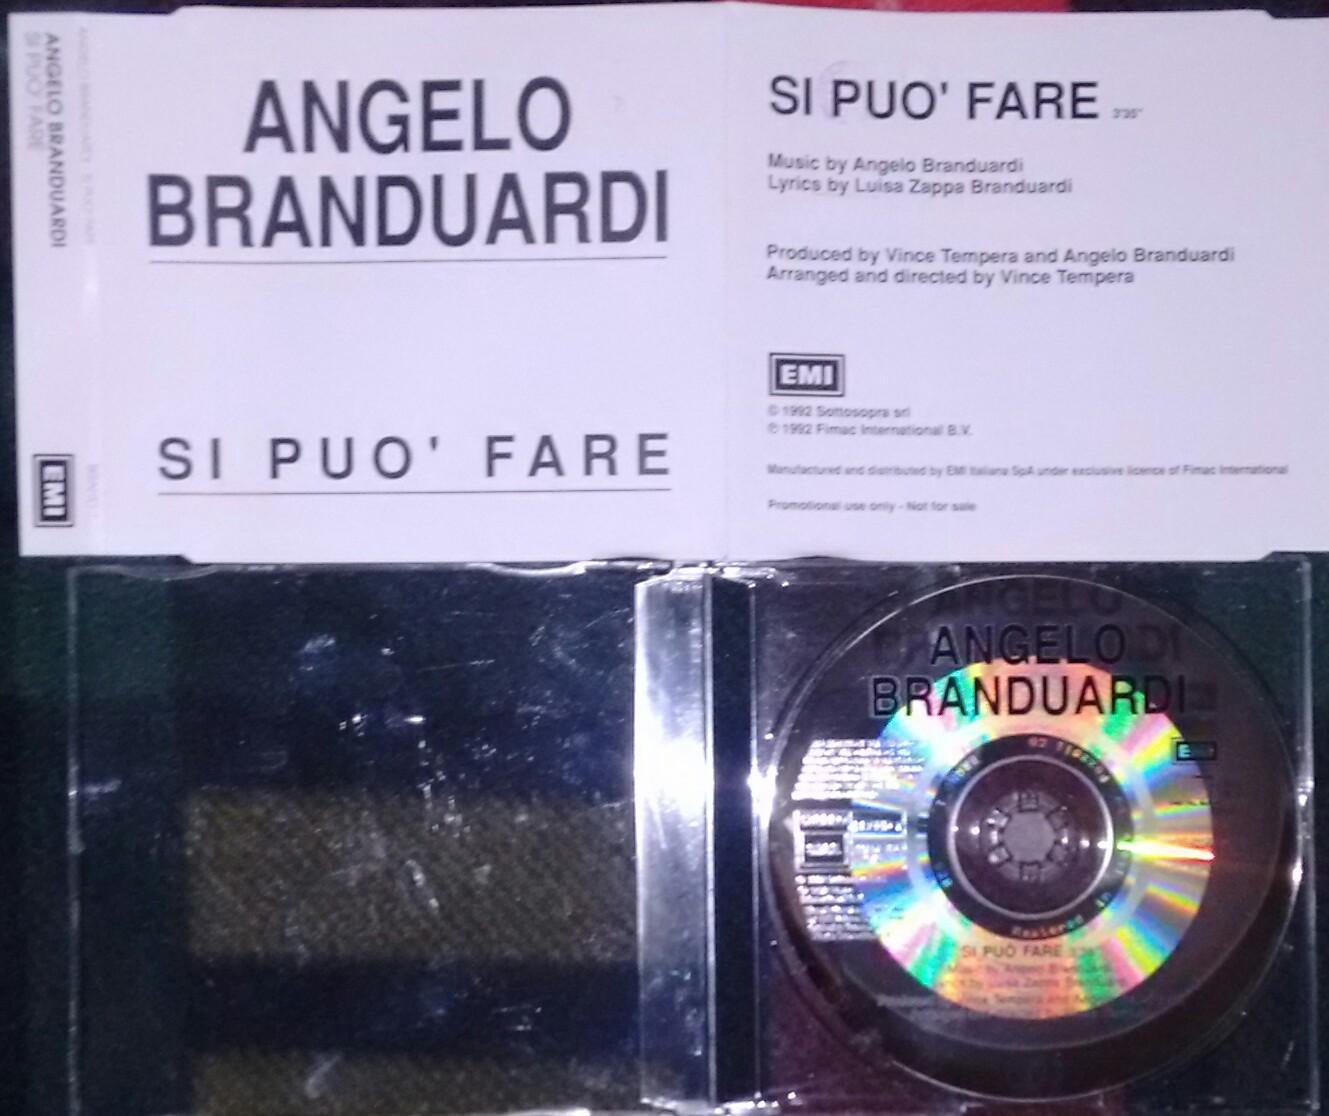 ANGELO BRANDUARDI - SI PUÒ FARE (CDS 1 TR)